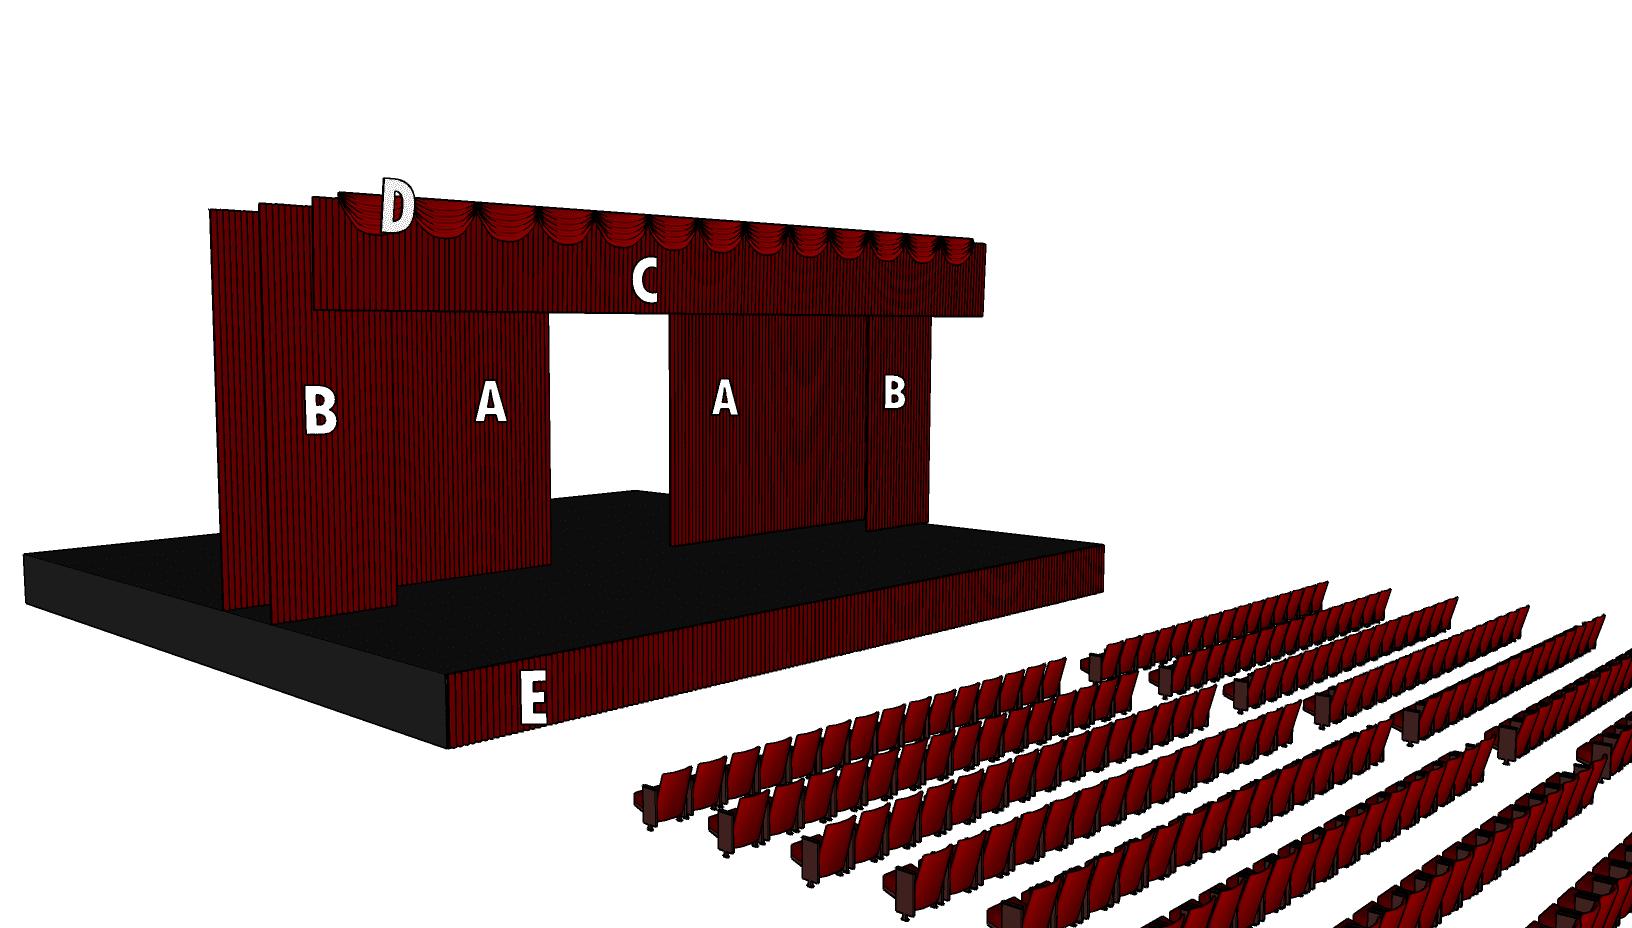 Partes de una embocadura de teatro